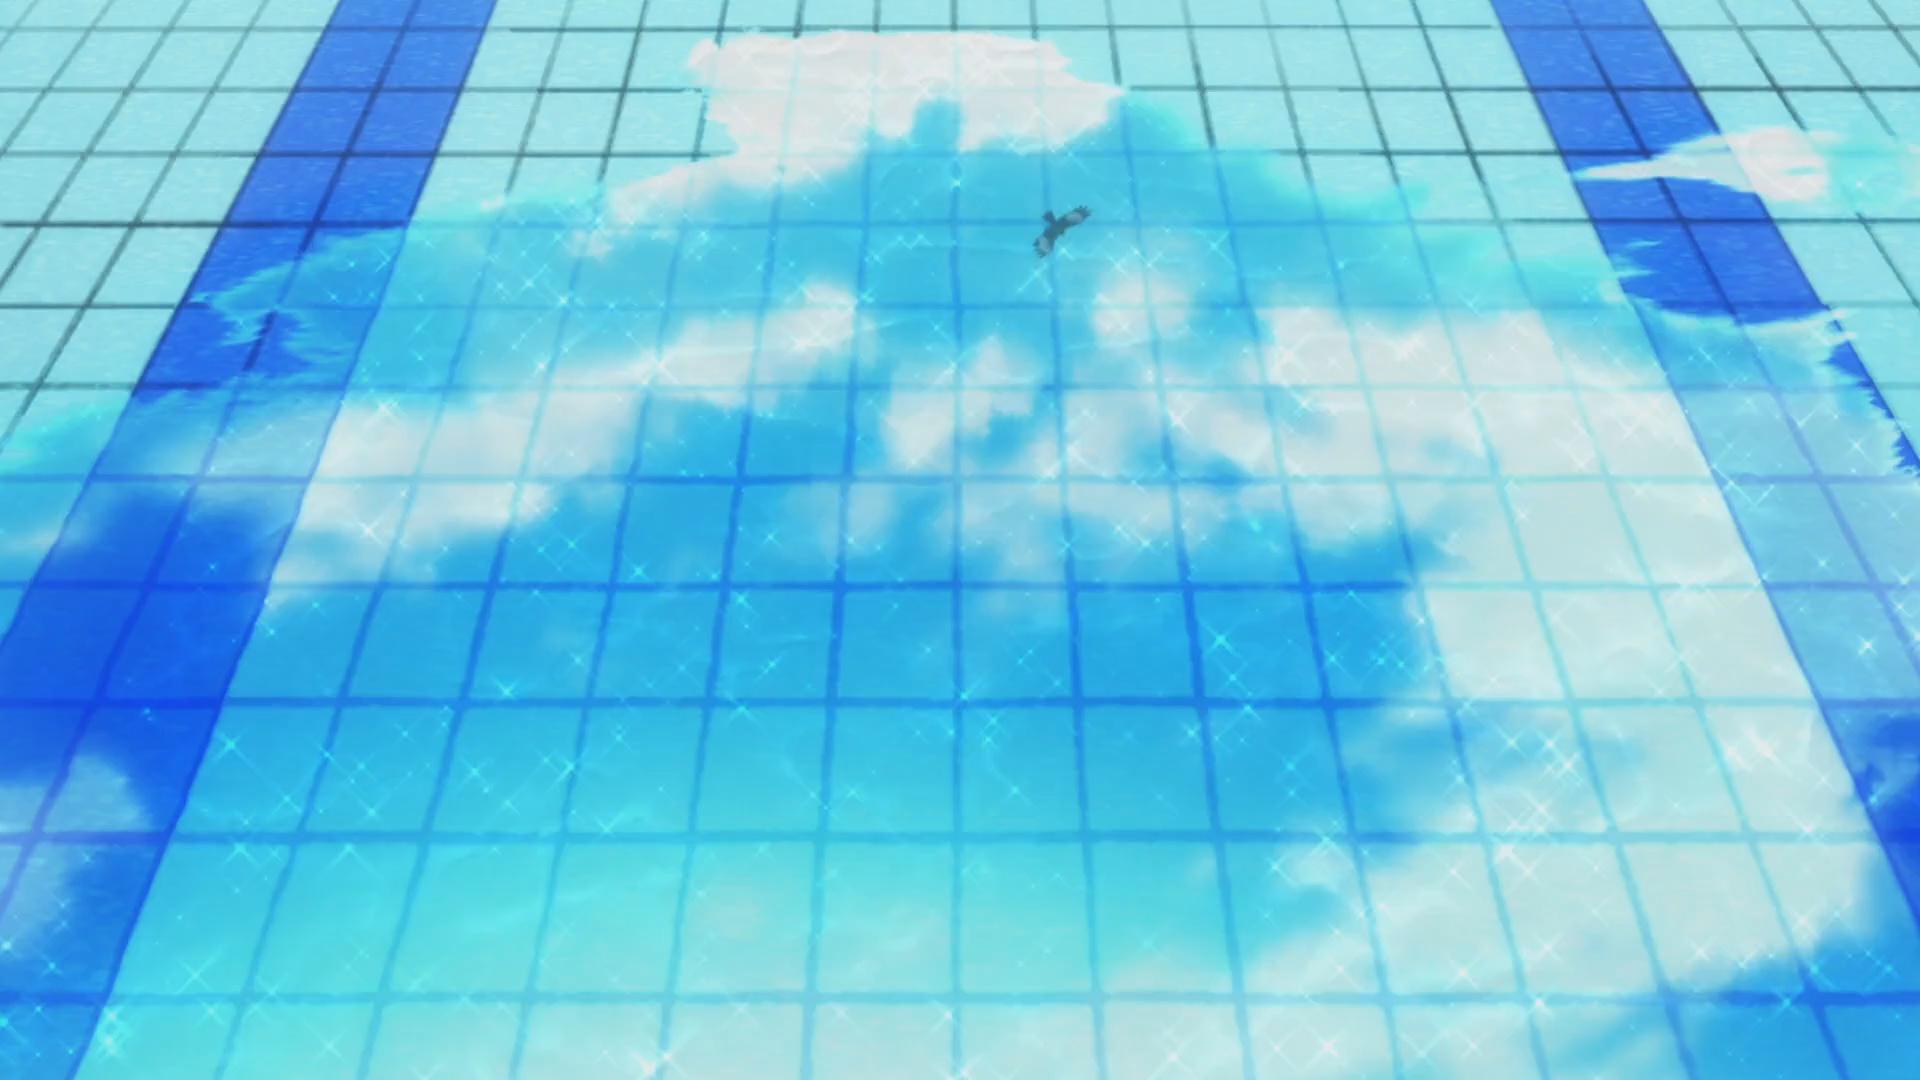 Anime Hawk Screech Sound